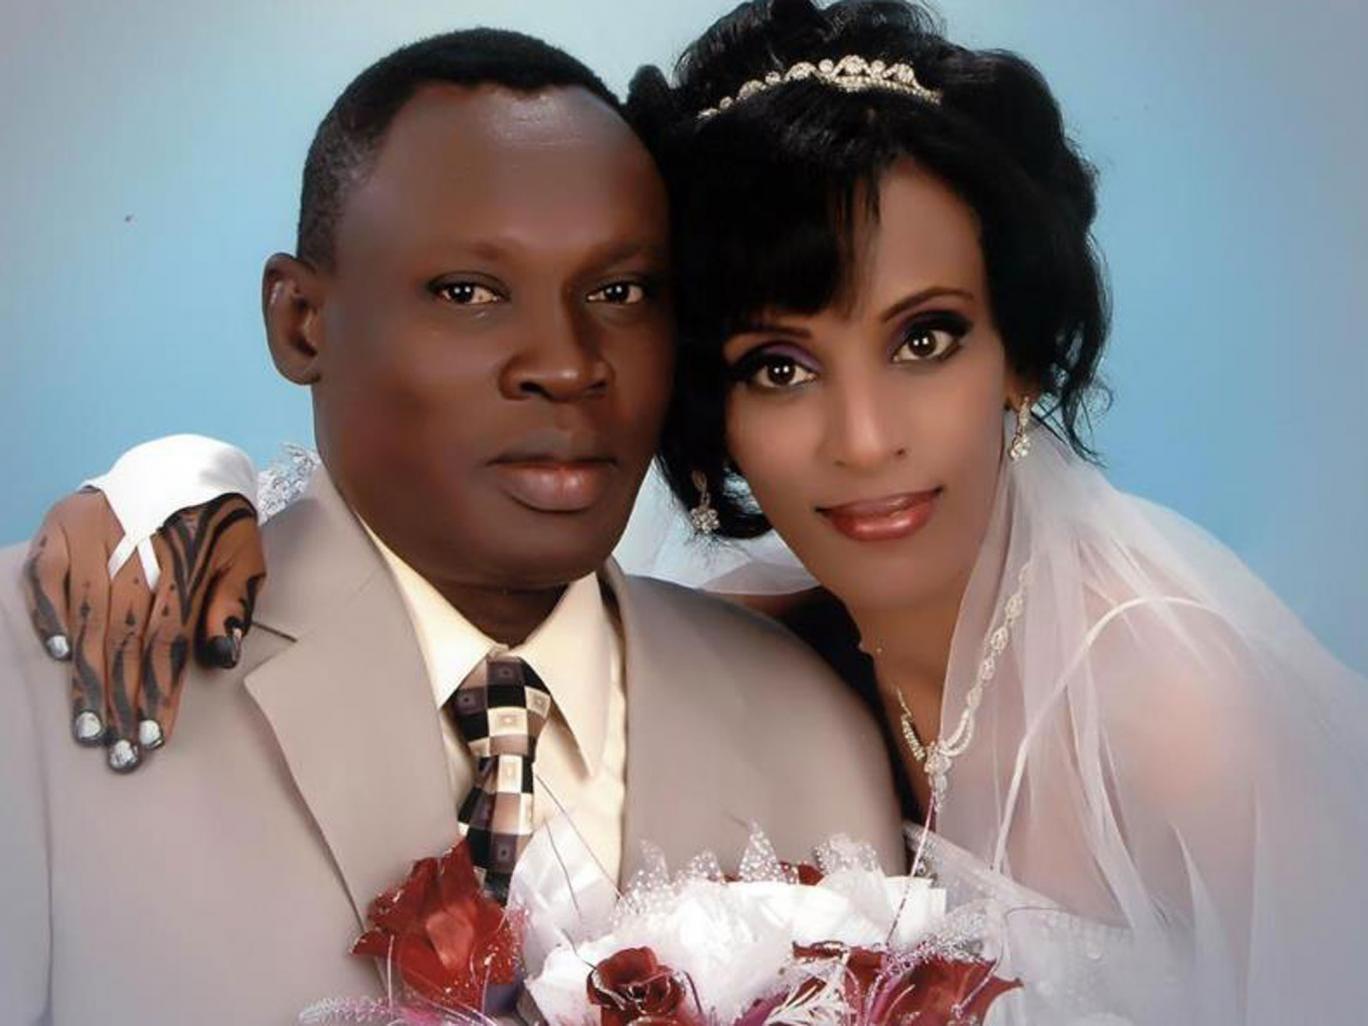 Meriam Ibrahim with her husband Daniel Wani